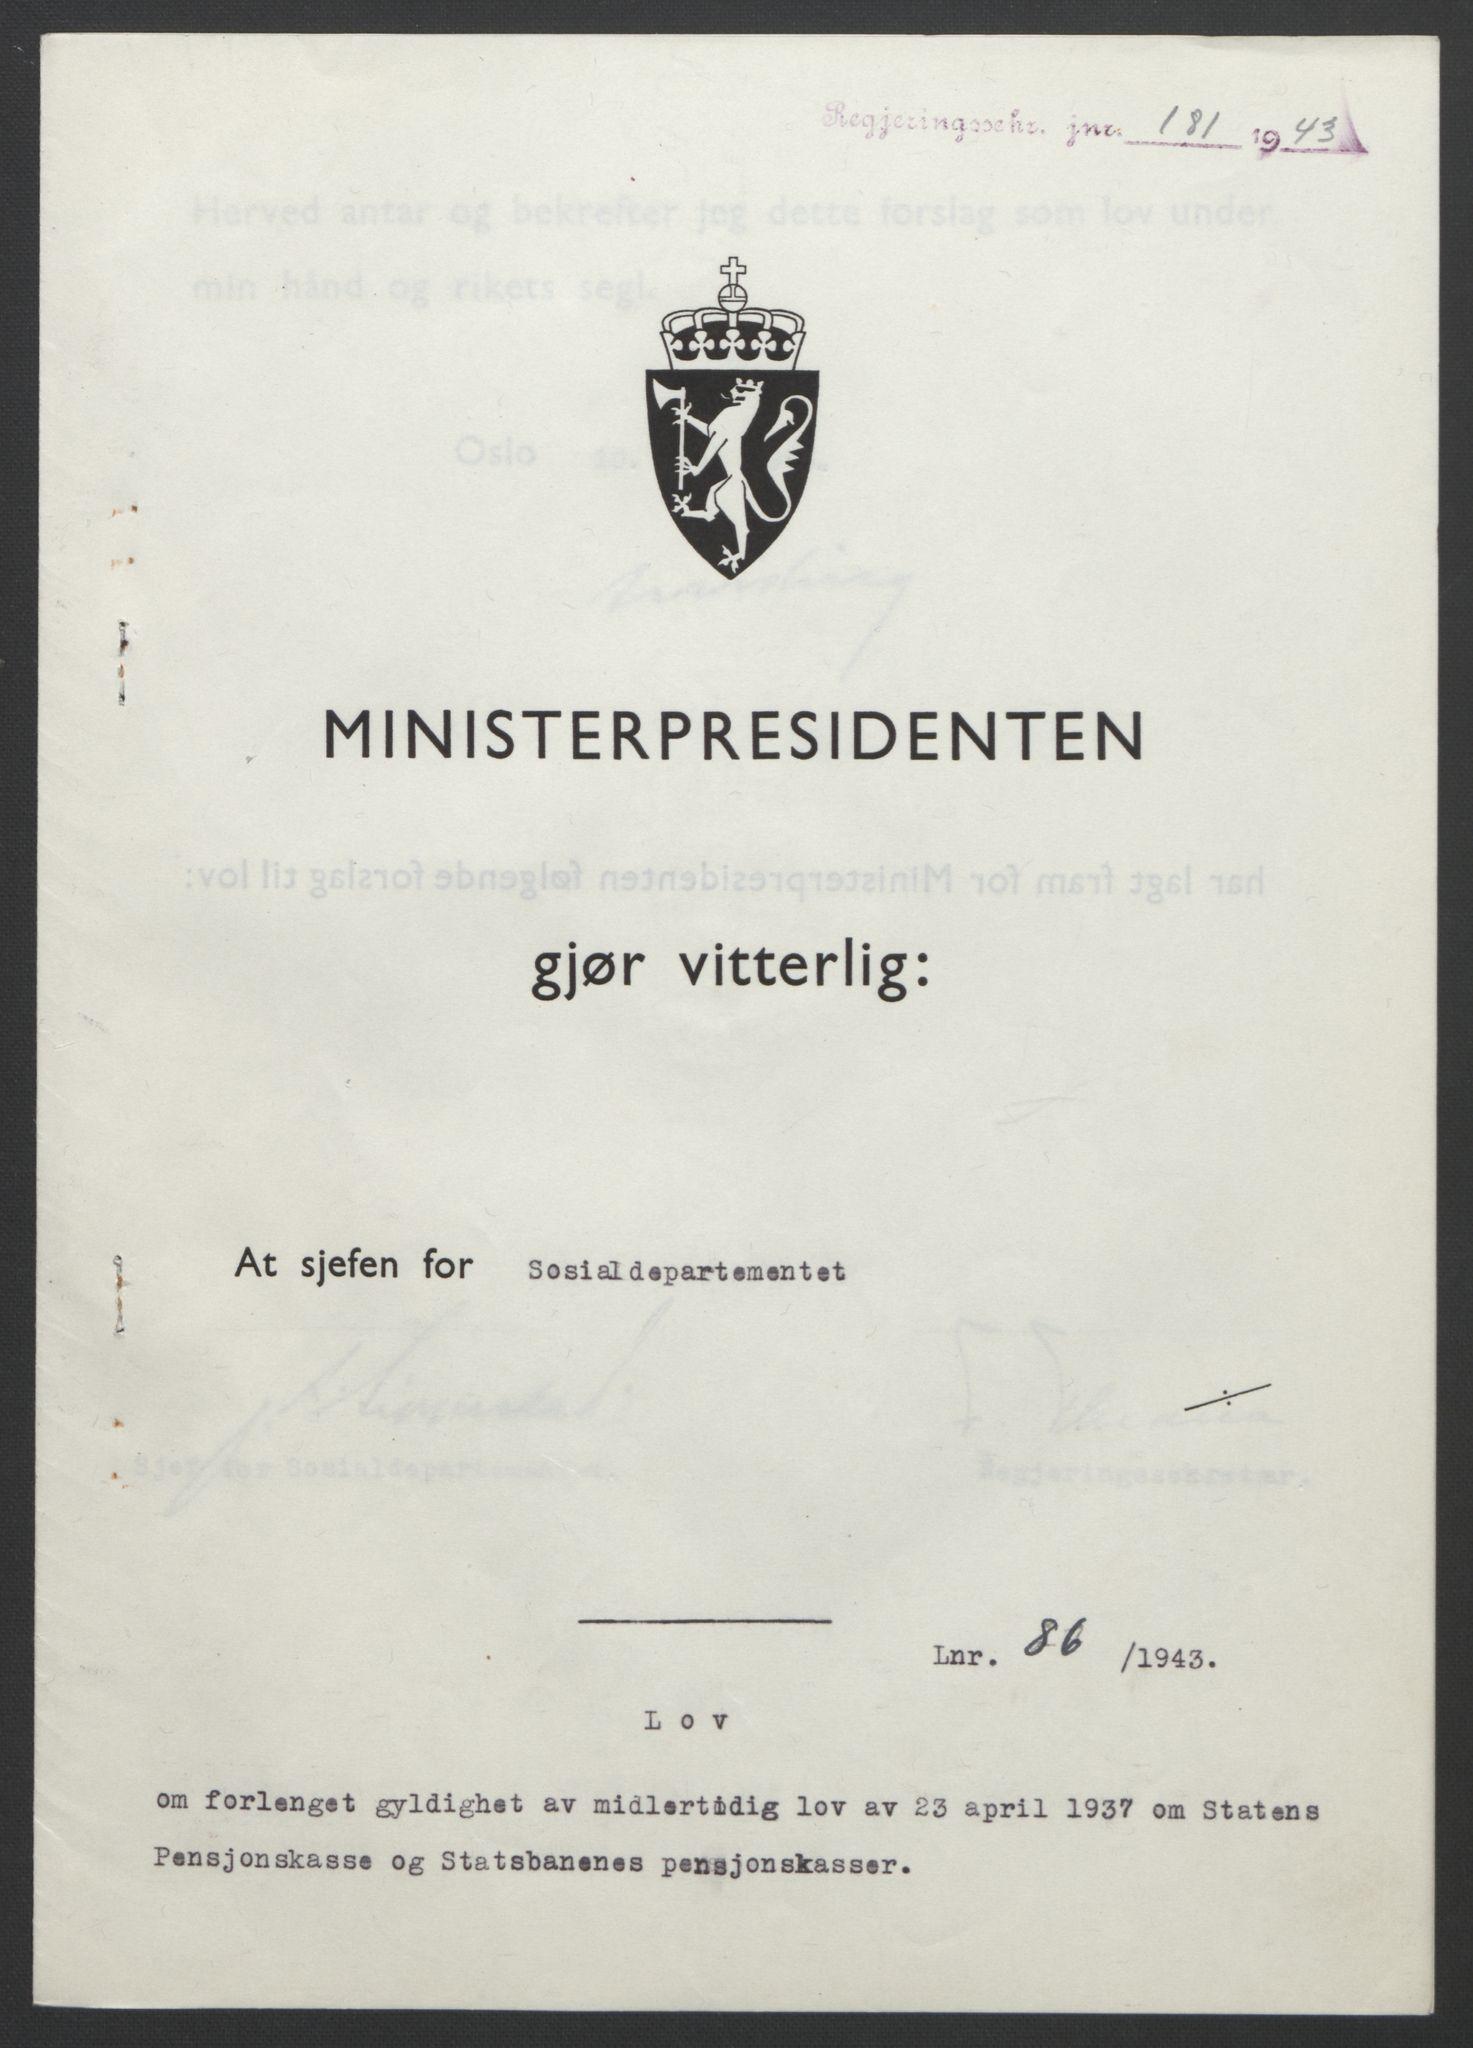 RA, NS-administrasjonen 1940-1945 (Statsrådsekretariatet, de kommisariske statsråder mm), D/Db/L0099: Lover, 1943, s. 392